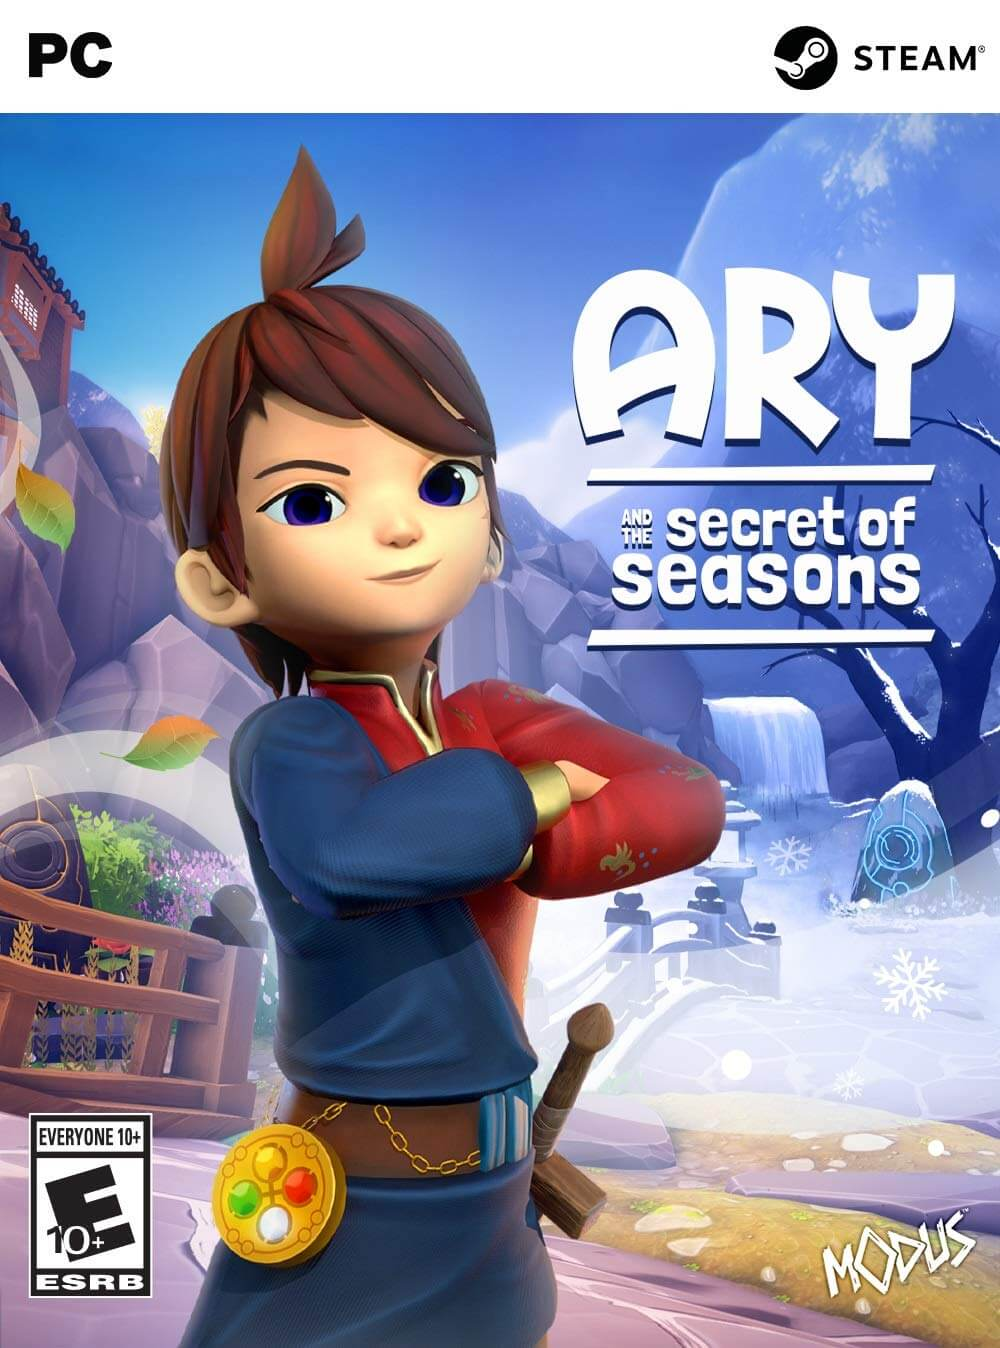 تحميل لعبة Ary and the Secret of Seasons للكمبيوتر برابط مباشر